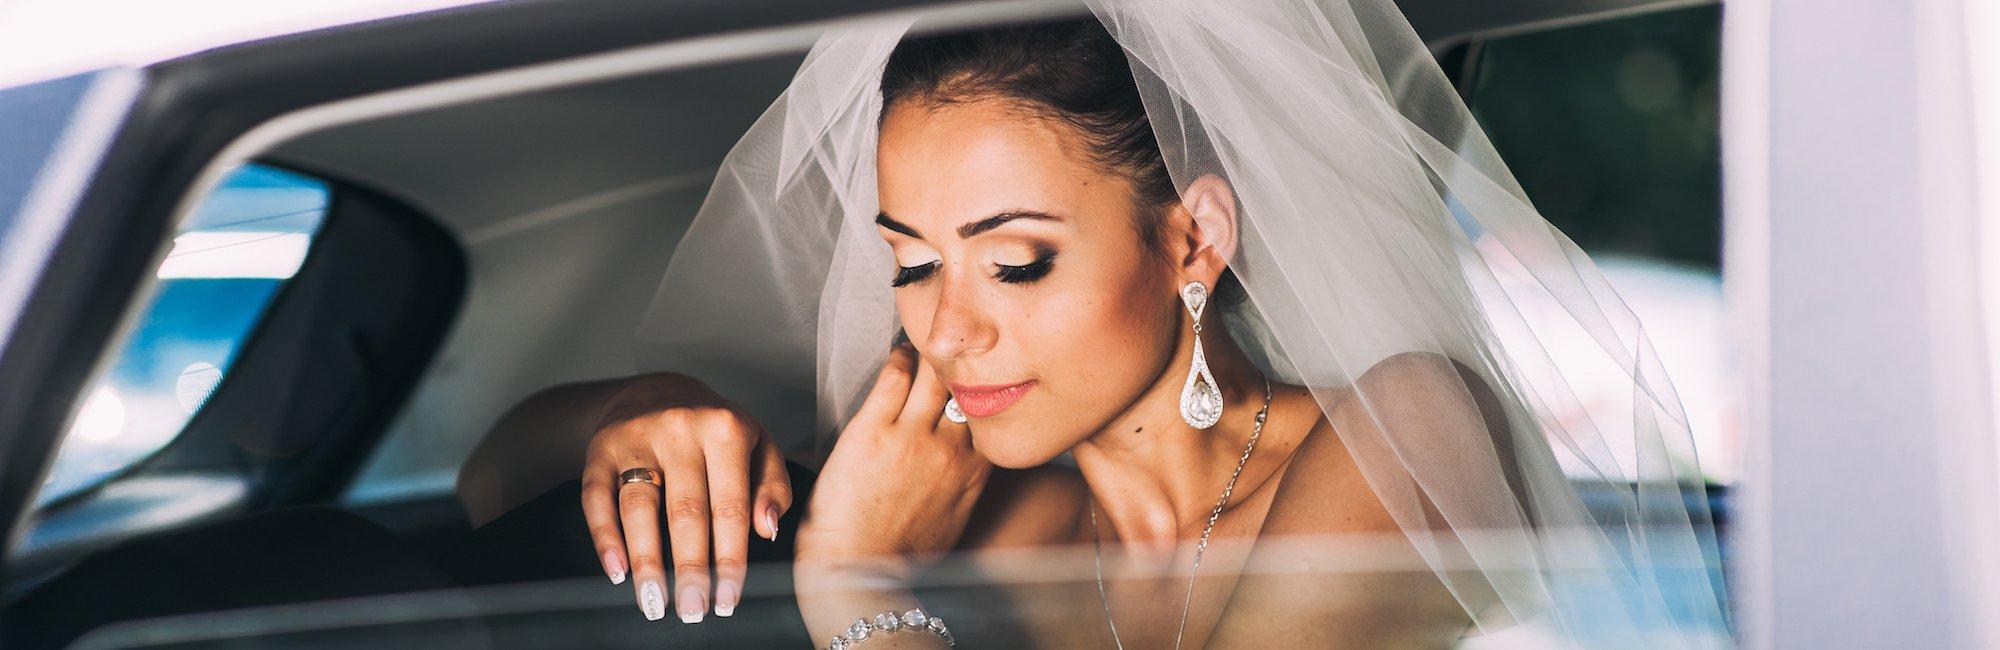 Avis Limousine Brooklyn Ny Wedding Limousine Service Rates